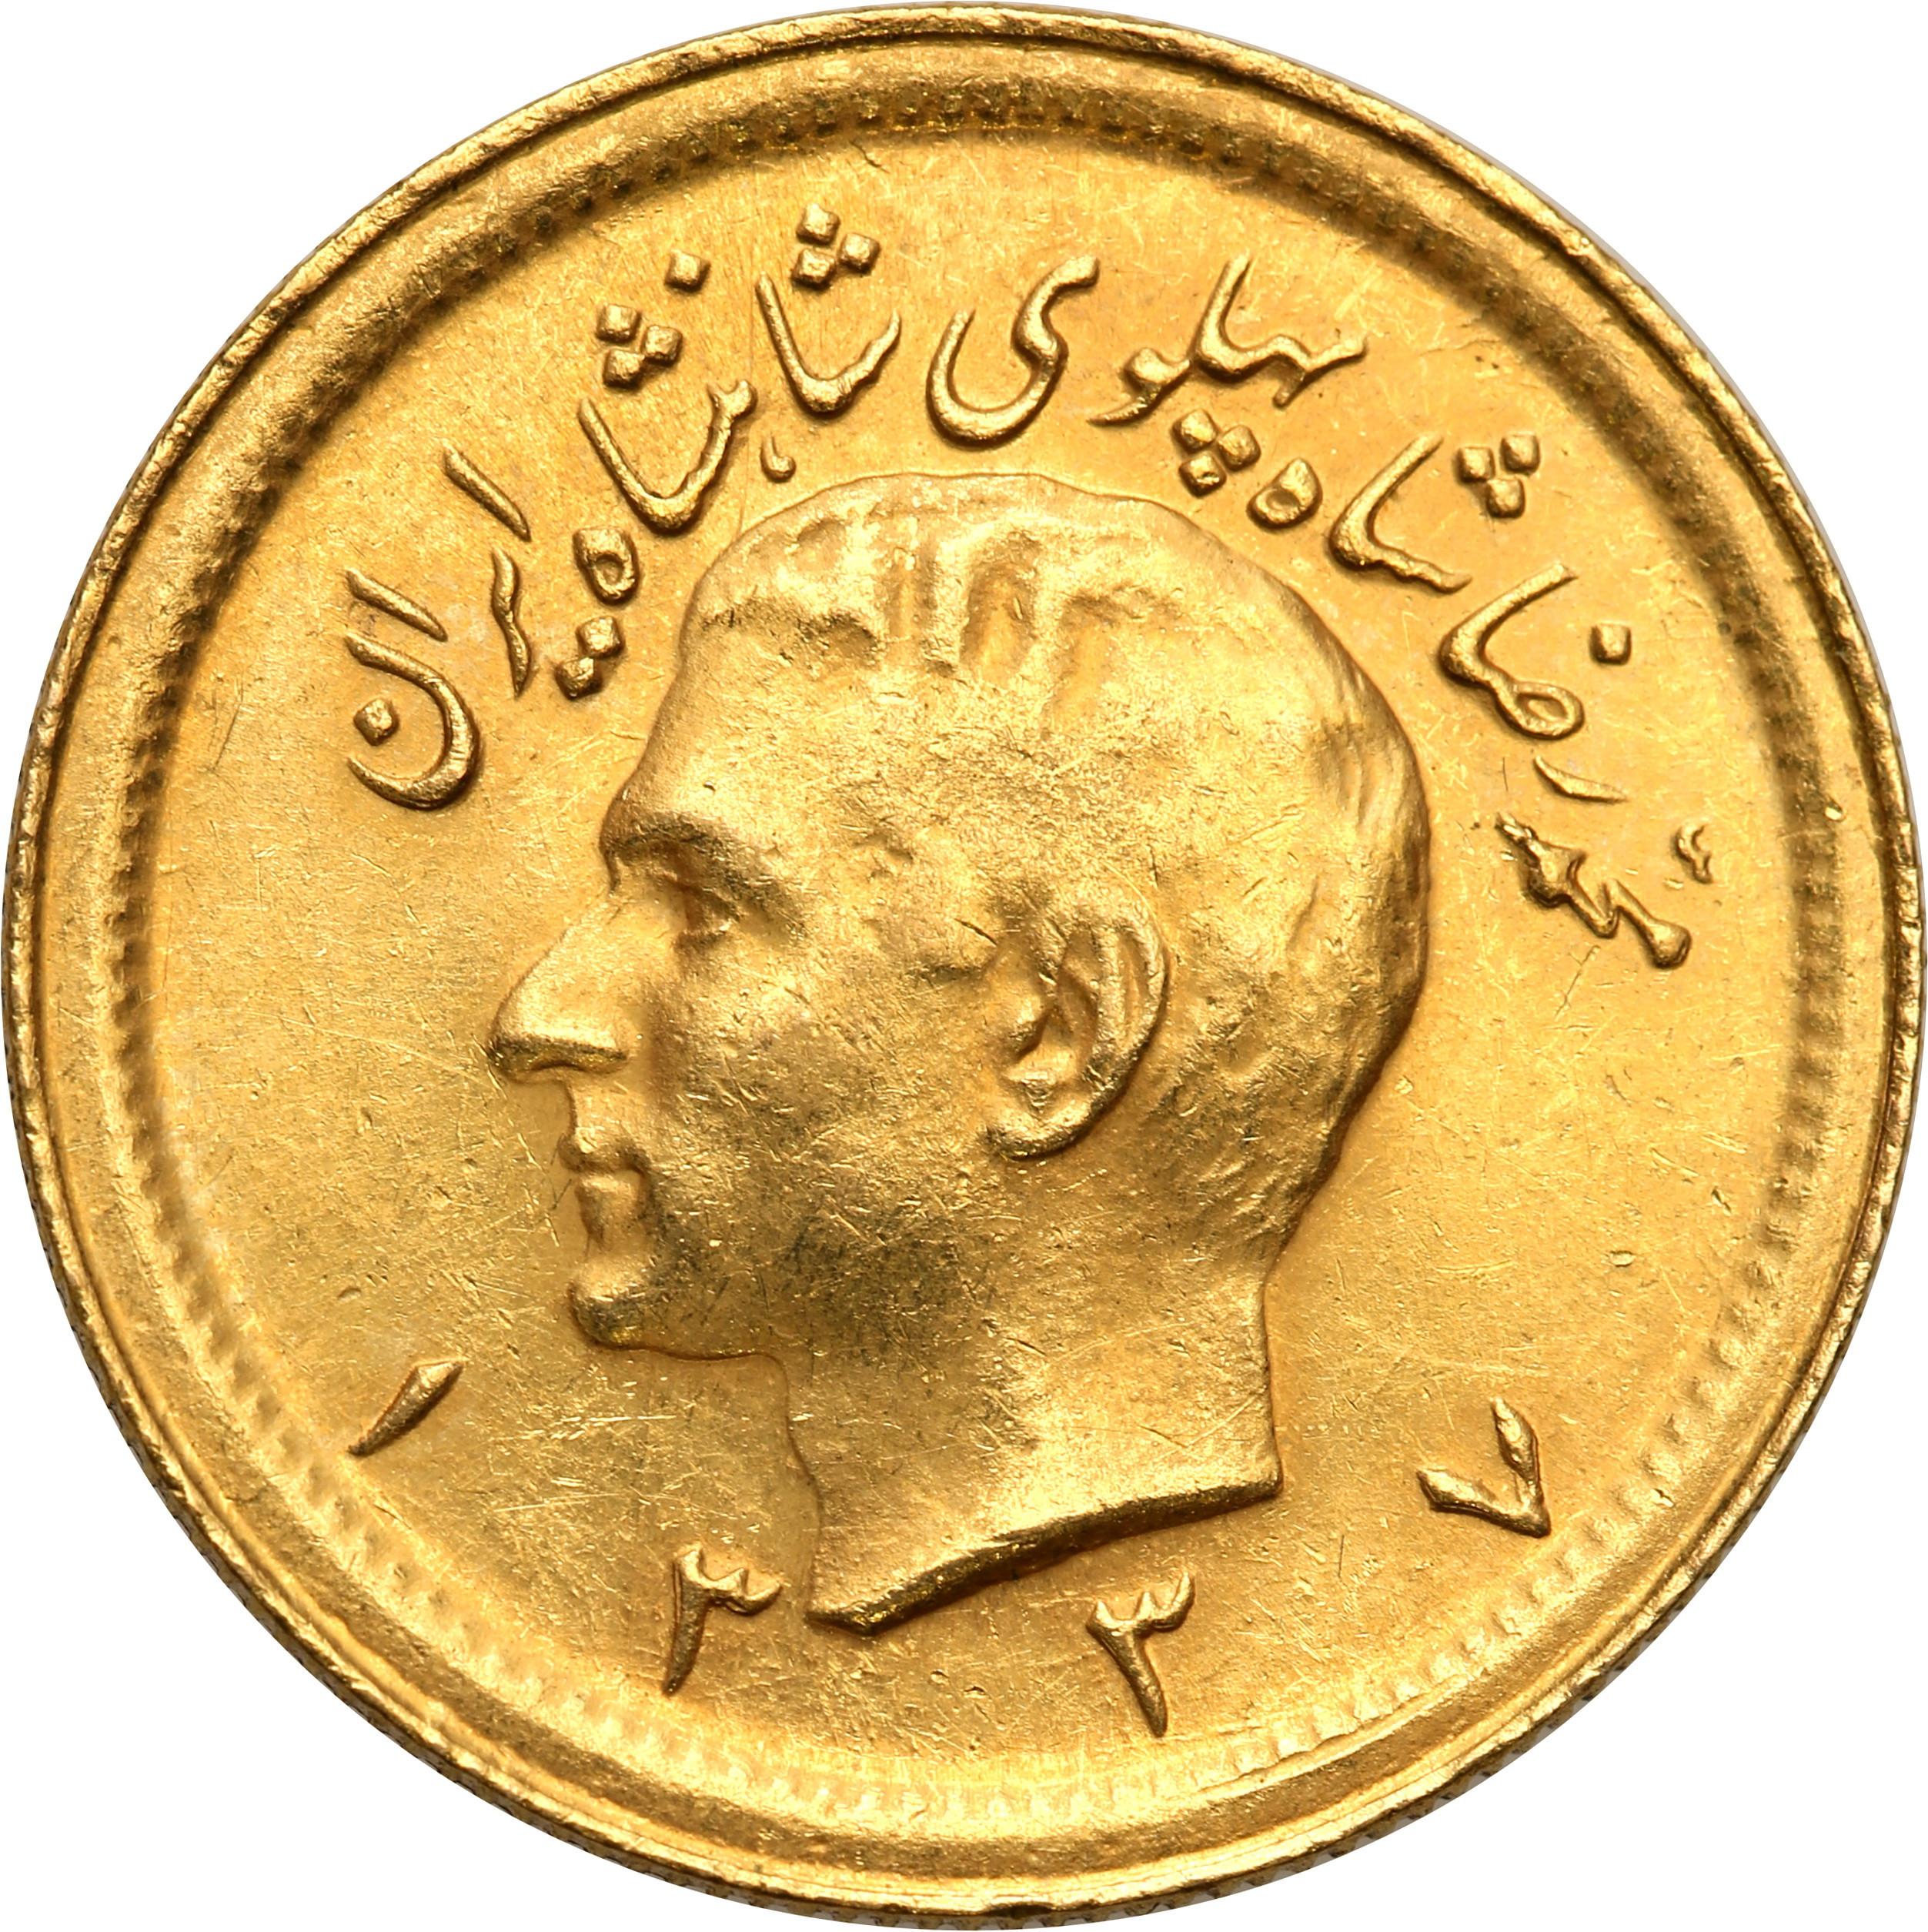 Iran. 1 Pahlevi 1337 SH (1958 AD) st.1